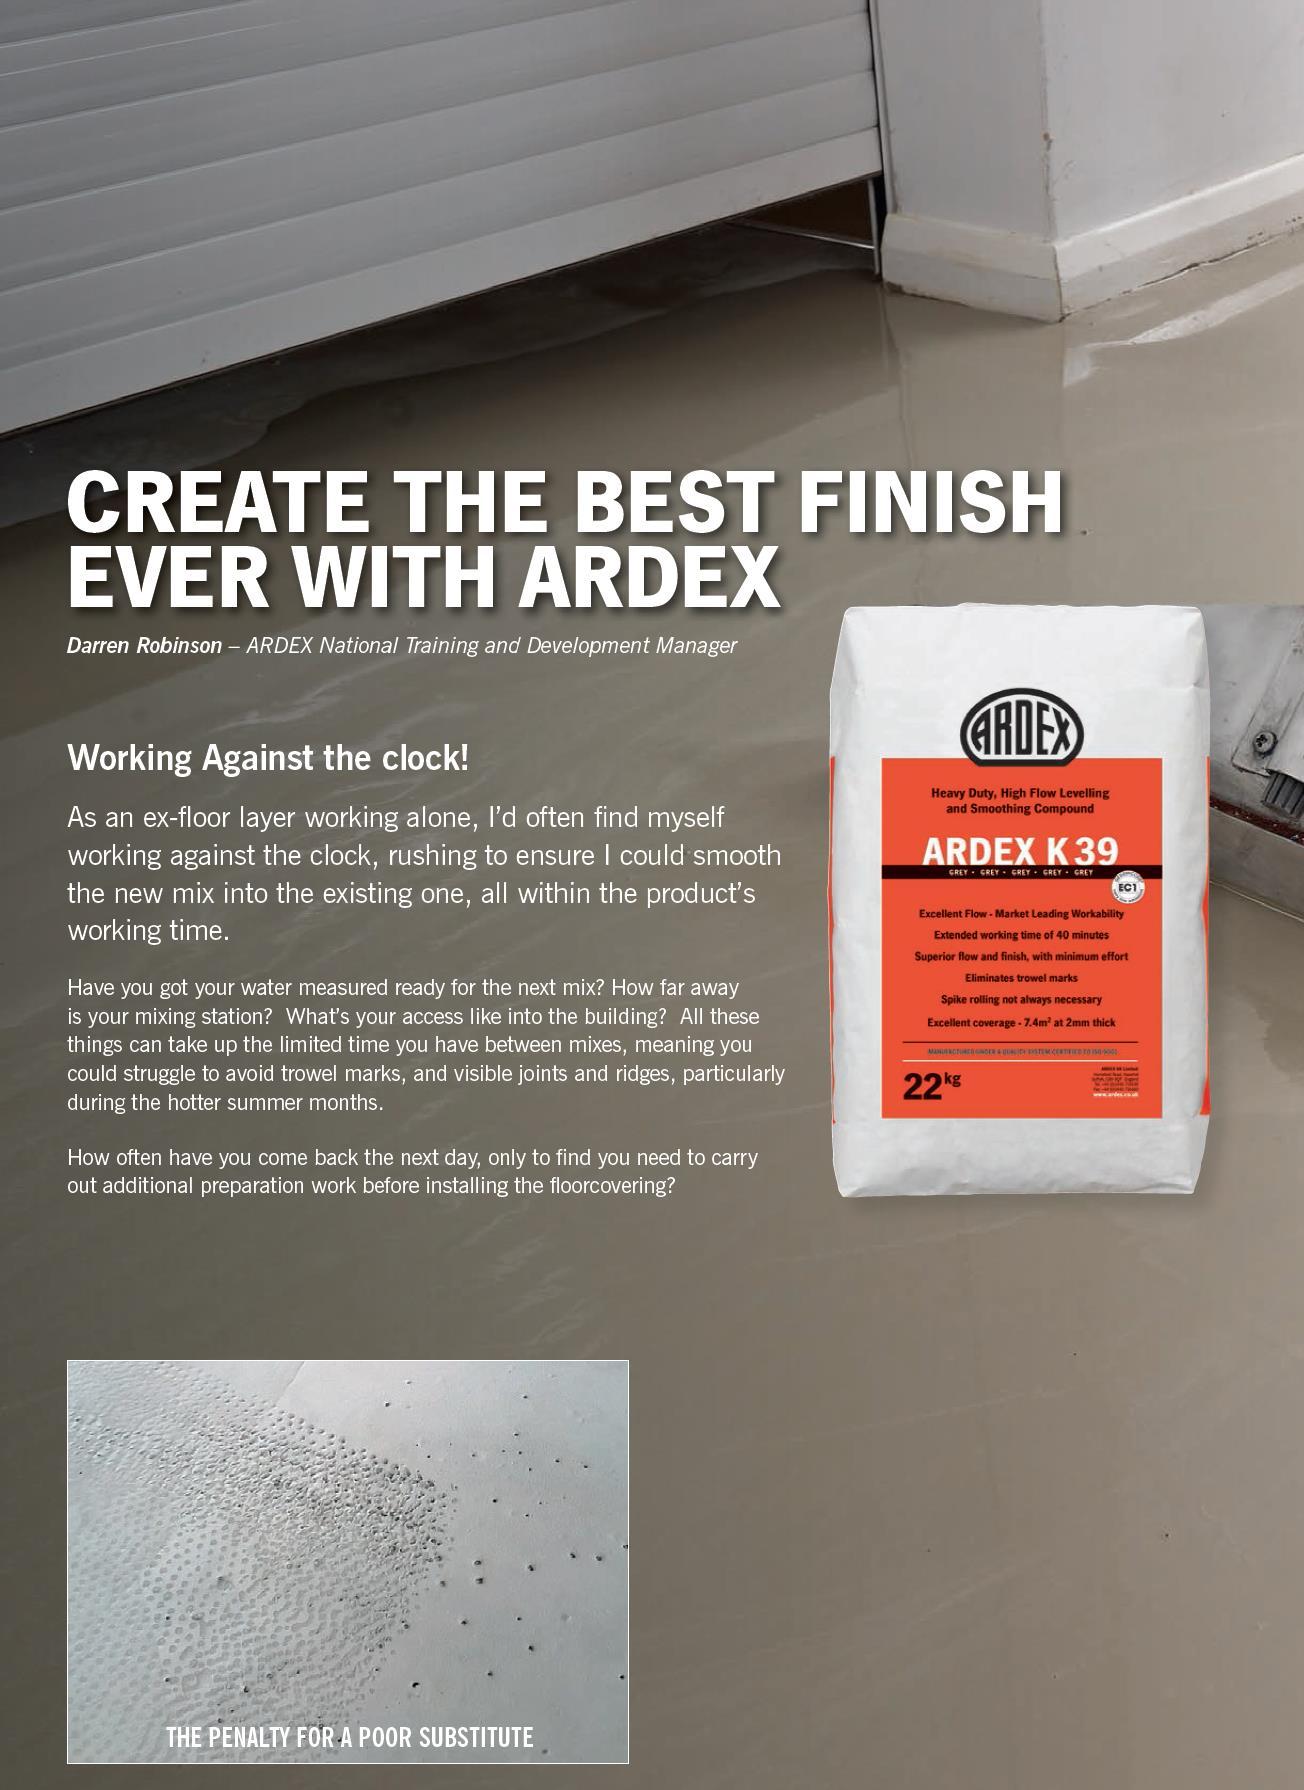 Ardex Feather Finish Ardex Primer Ardex K 39 Tiling